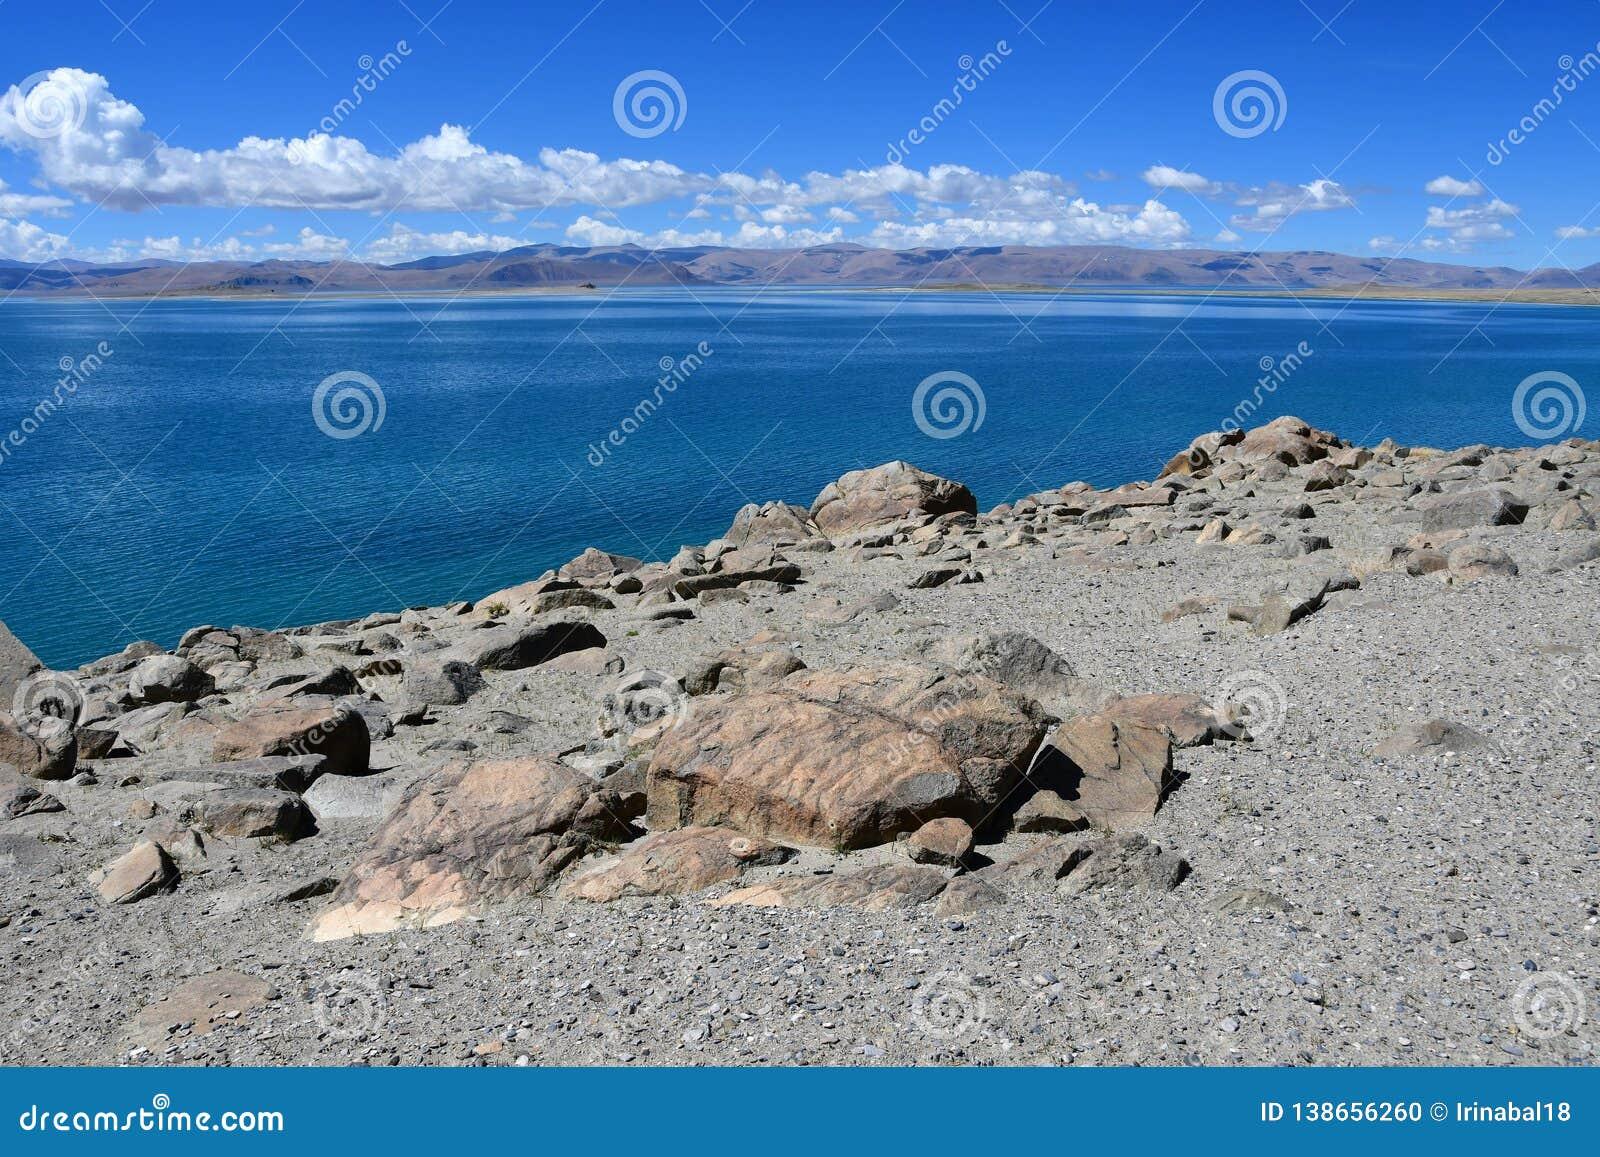 Китай Великие озера Тибета Озеро Teri Tashi Namtso в солнечном дне в июне